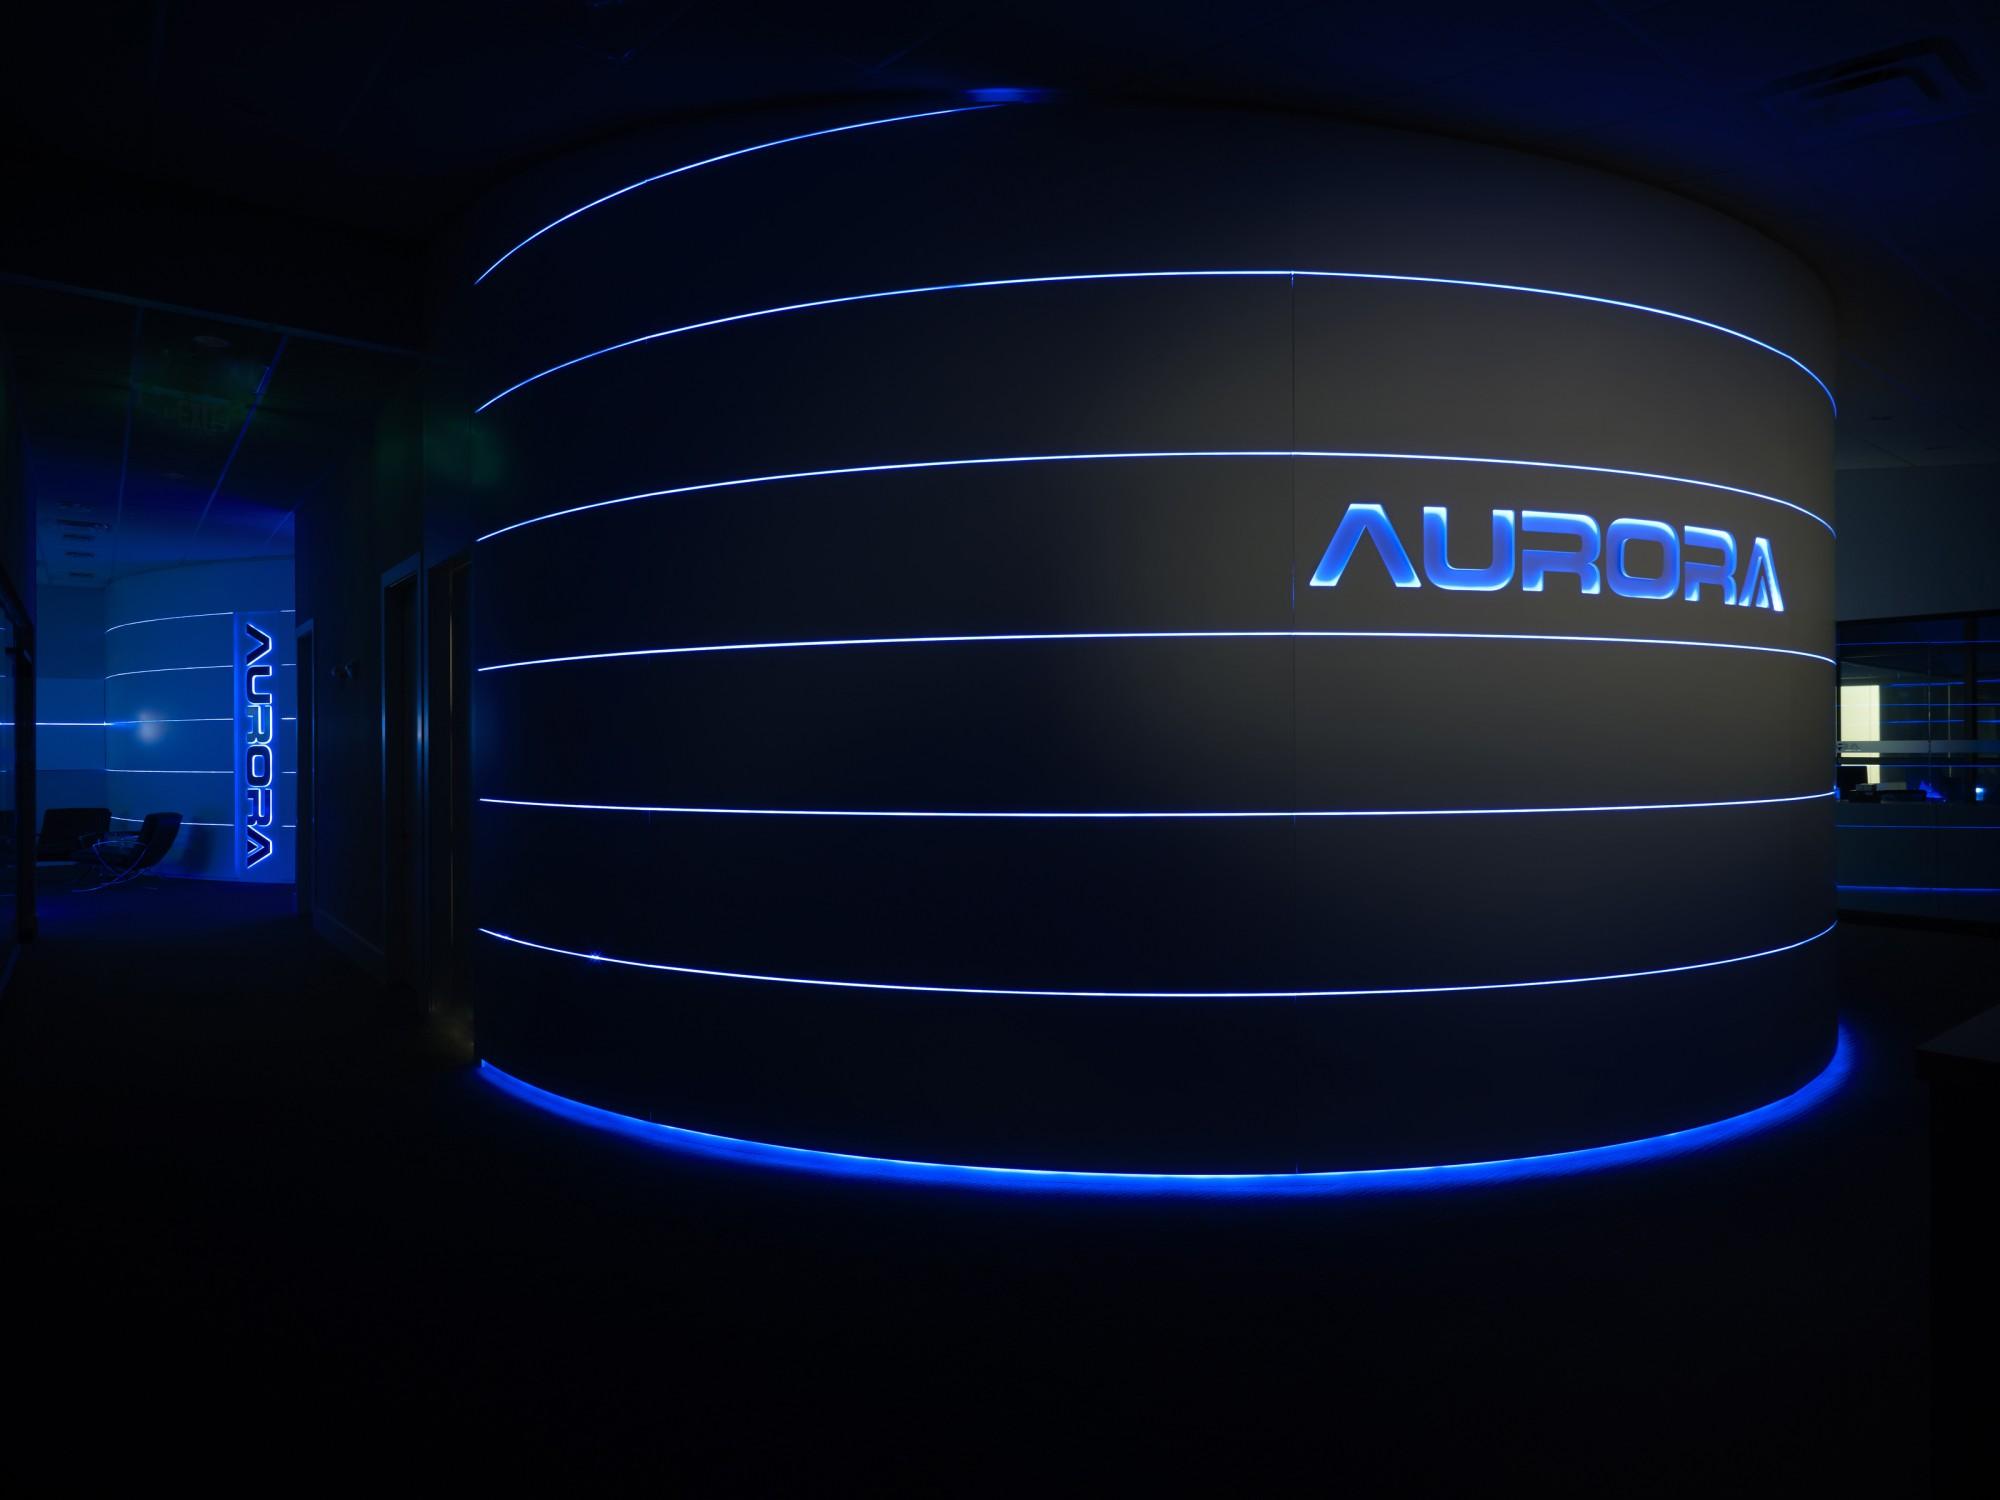 aurora_corporate_logowall_night.jpg